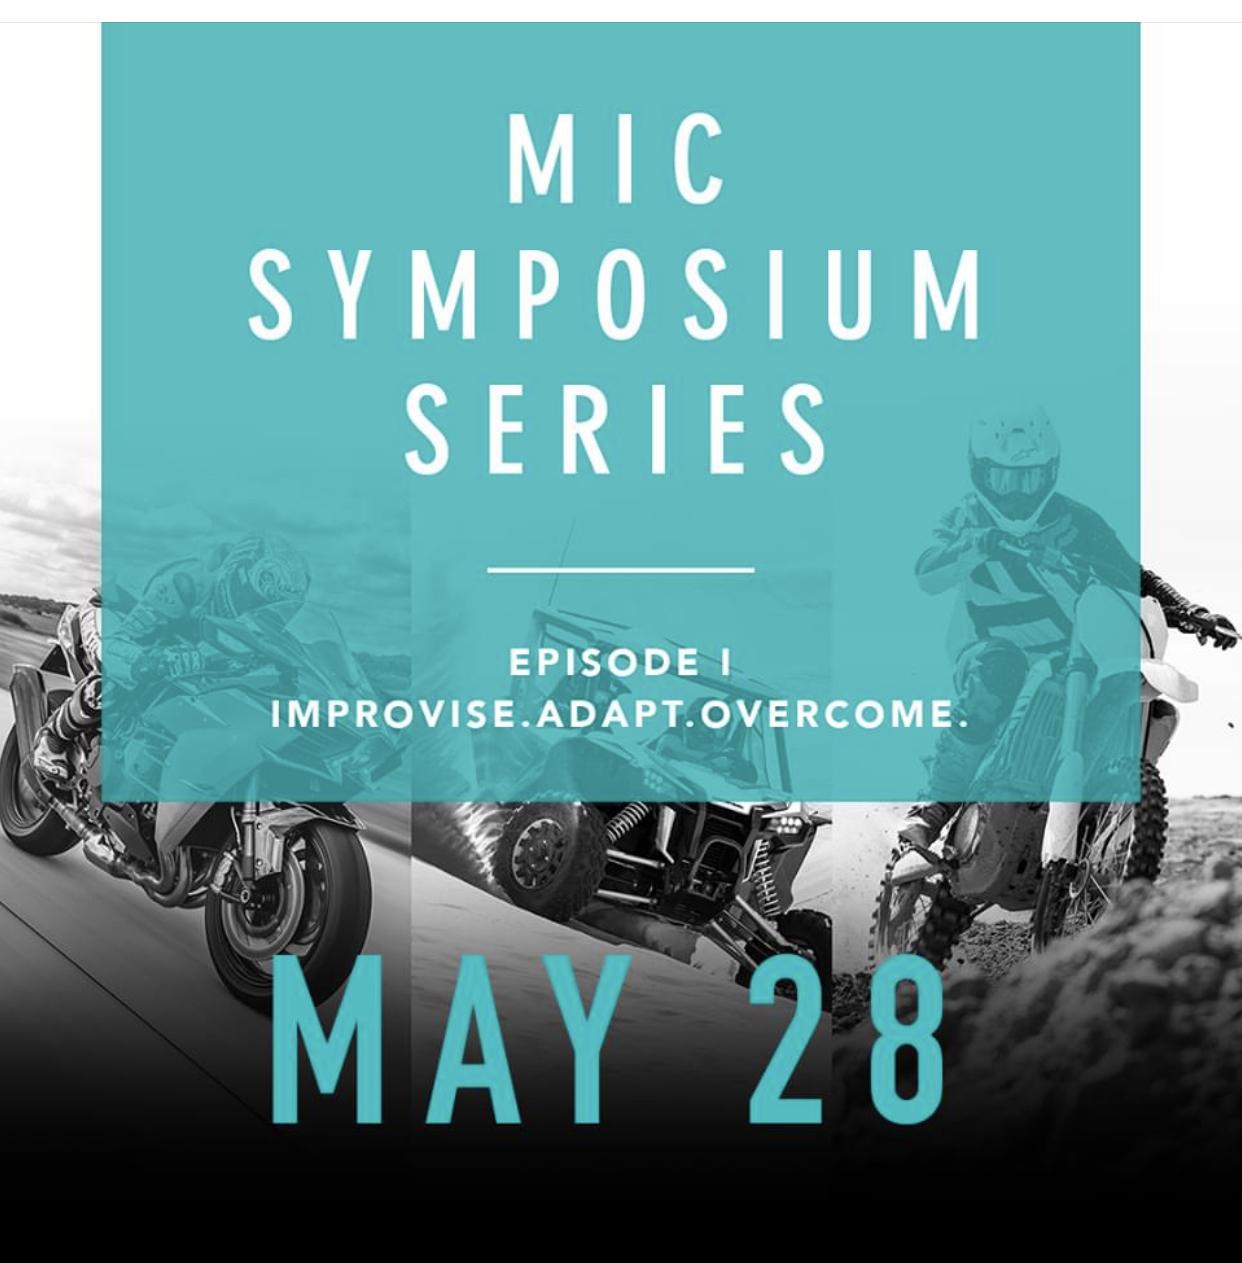 MIC Communications Symposium Goes Virtual